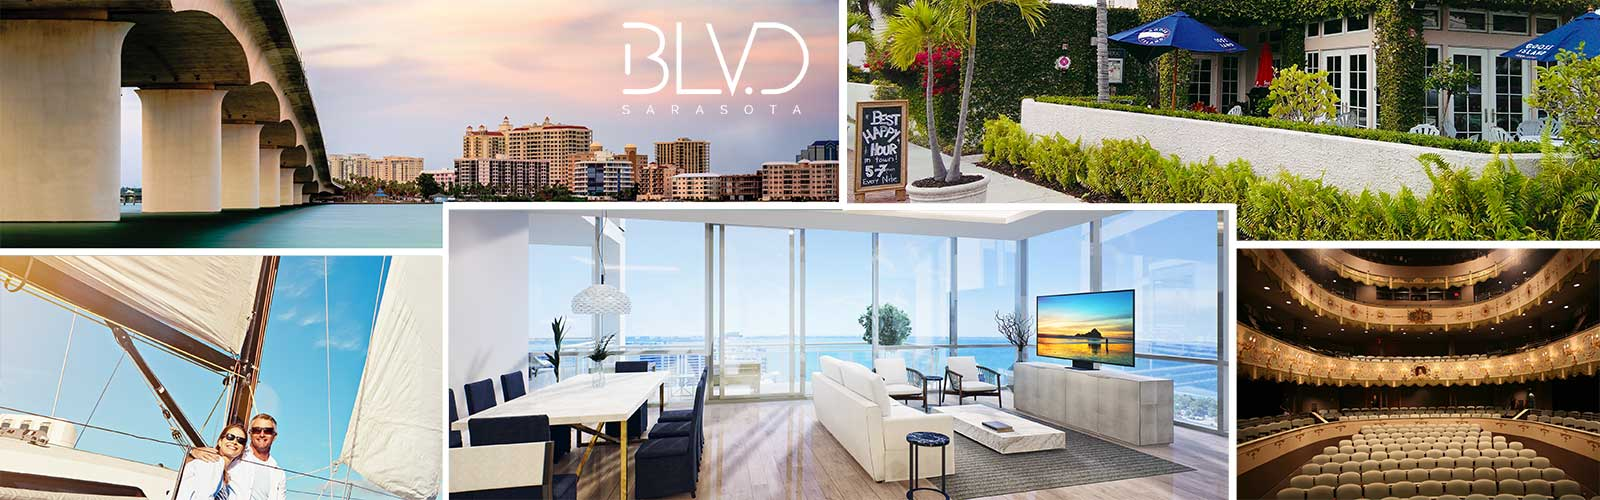 BLVD Sarasota, Downtown Sarasota, Luxury Condo